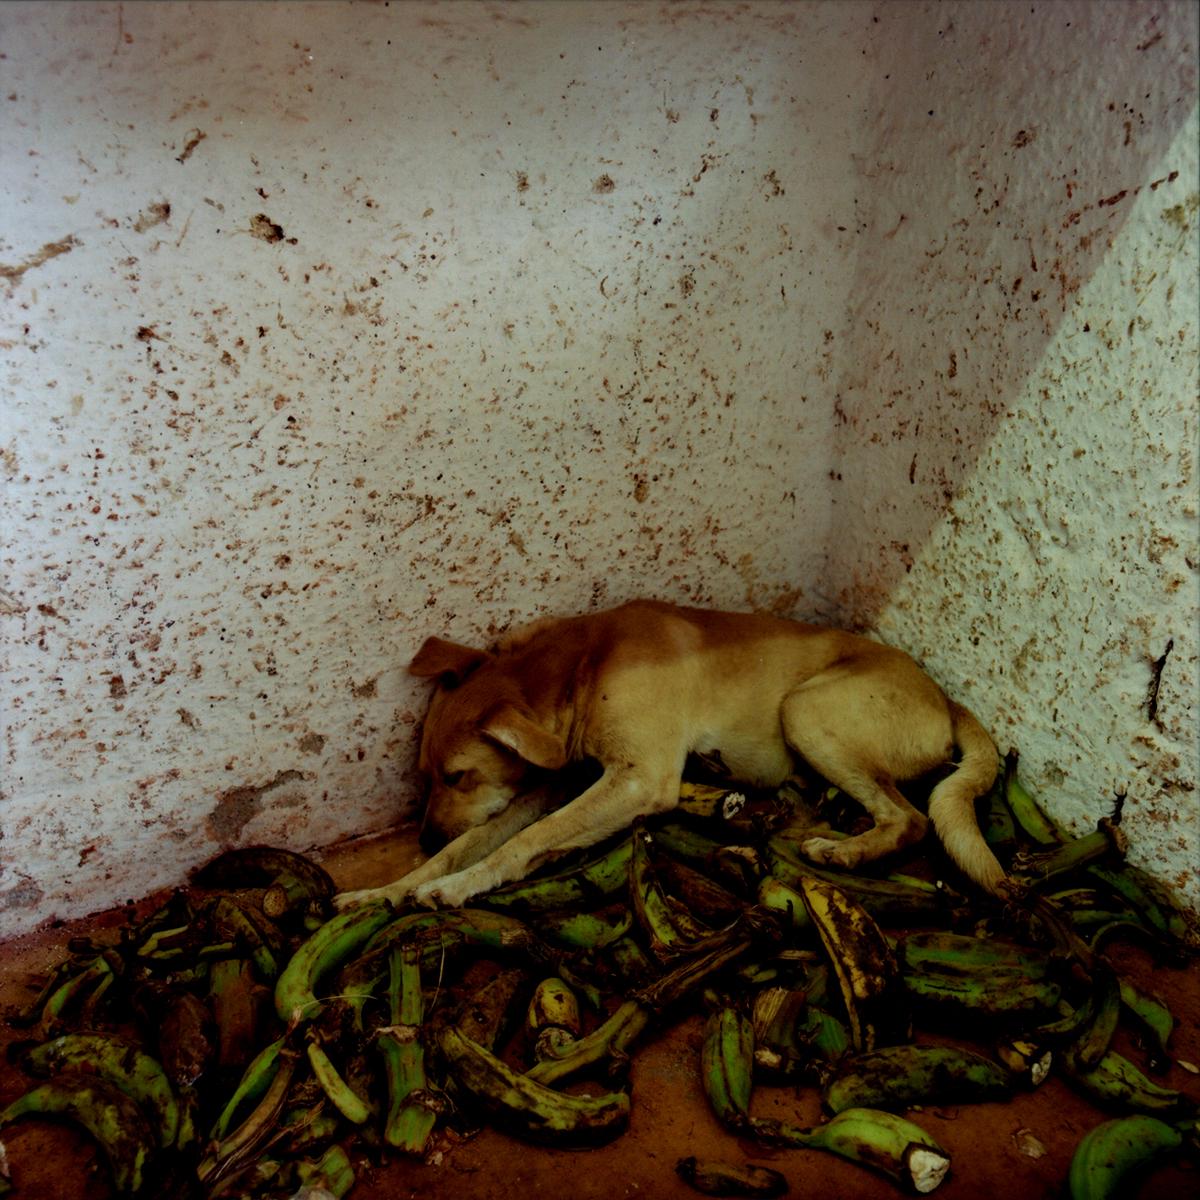 A stray dog sleeps on a bed of discarded plantains.Havana, Cuba